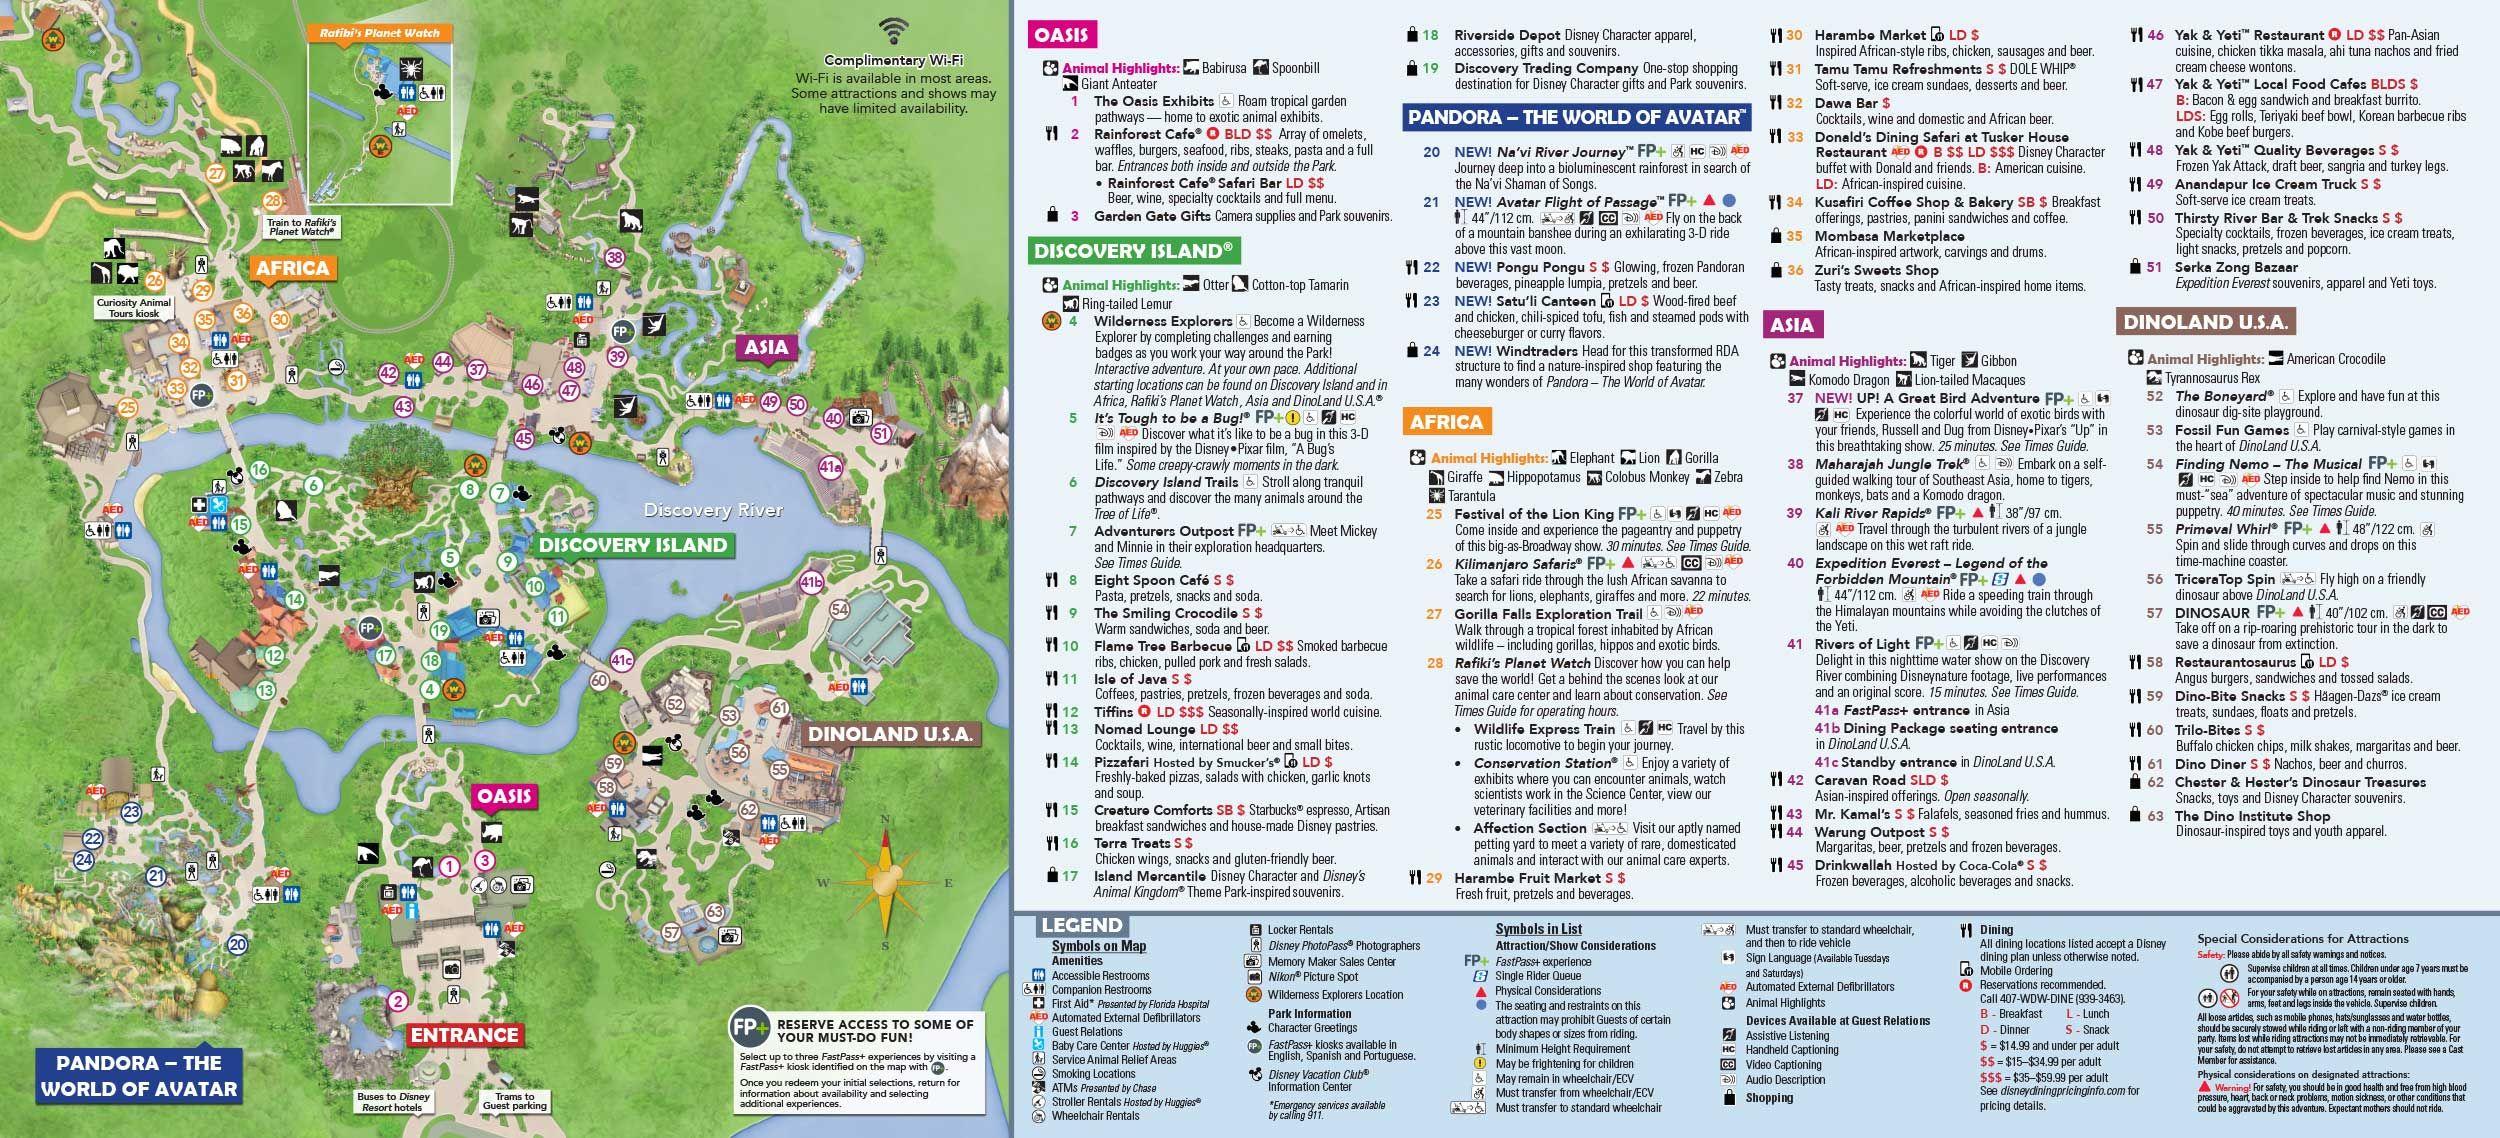 Disney's Animal Kingdom map Theme Park map | Dinsey Vaca in 2019